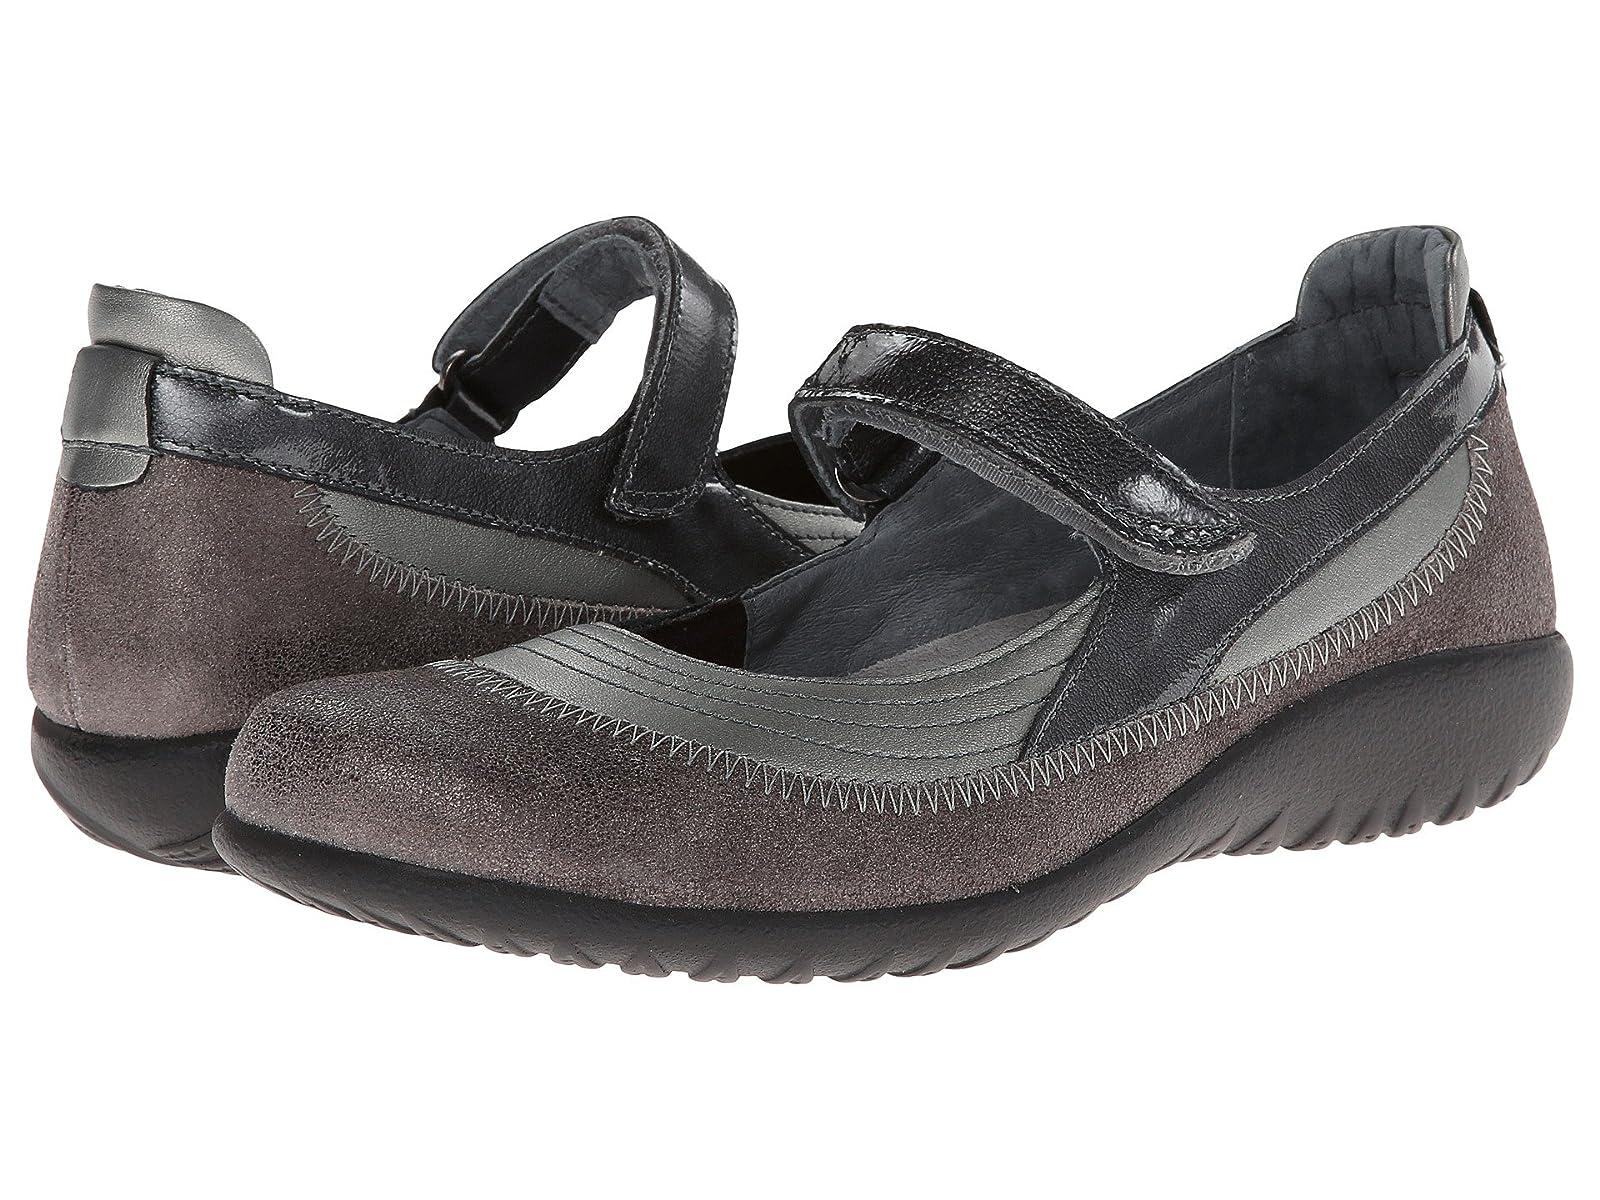 Naot KireiAtmospheric grades have affordable shoes